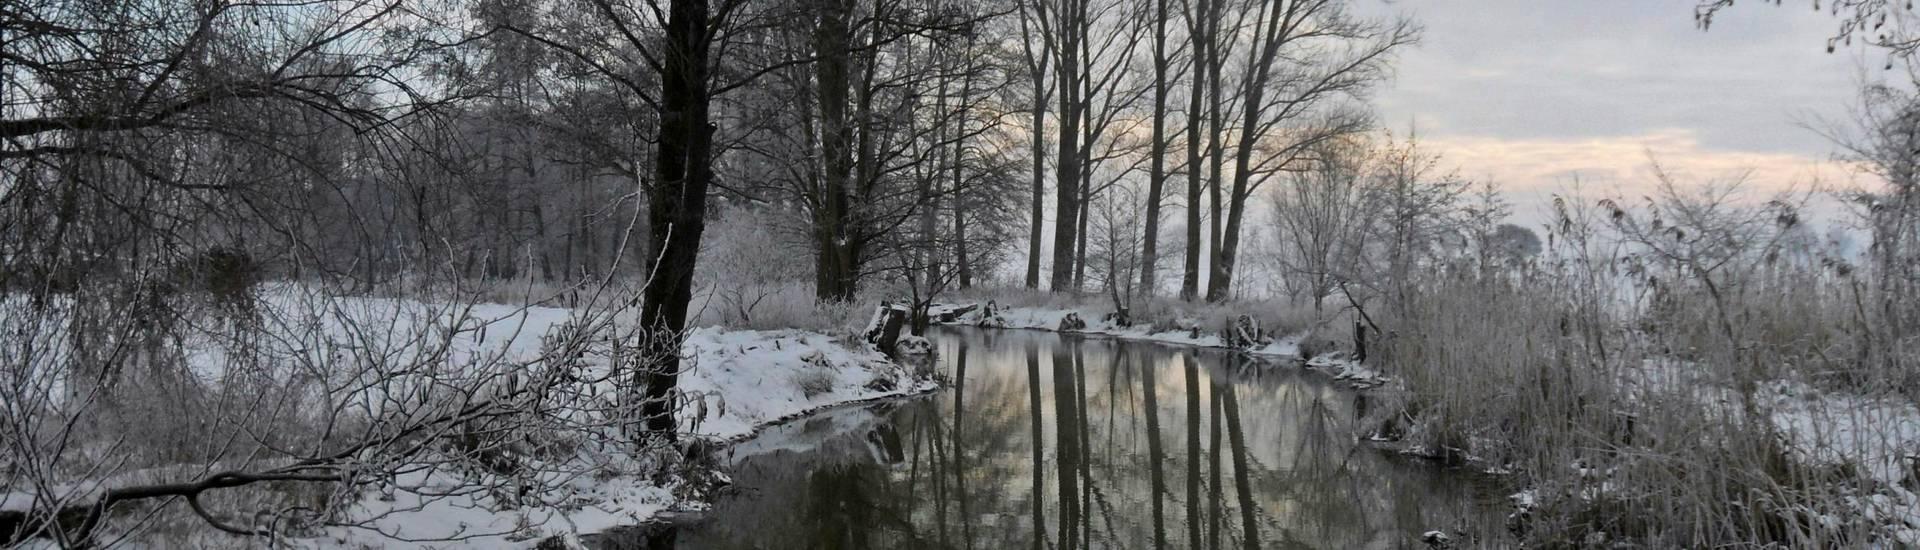 sam 0883bearbeitet ©Simone Grieger